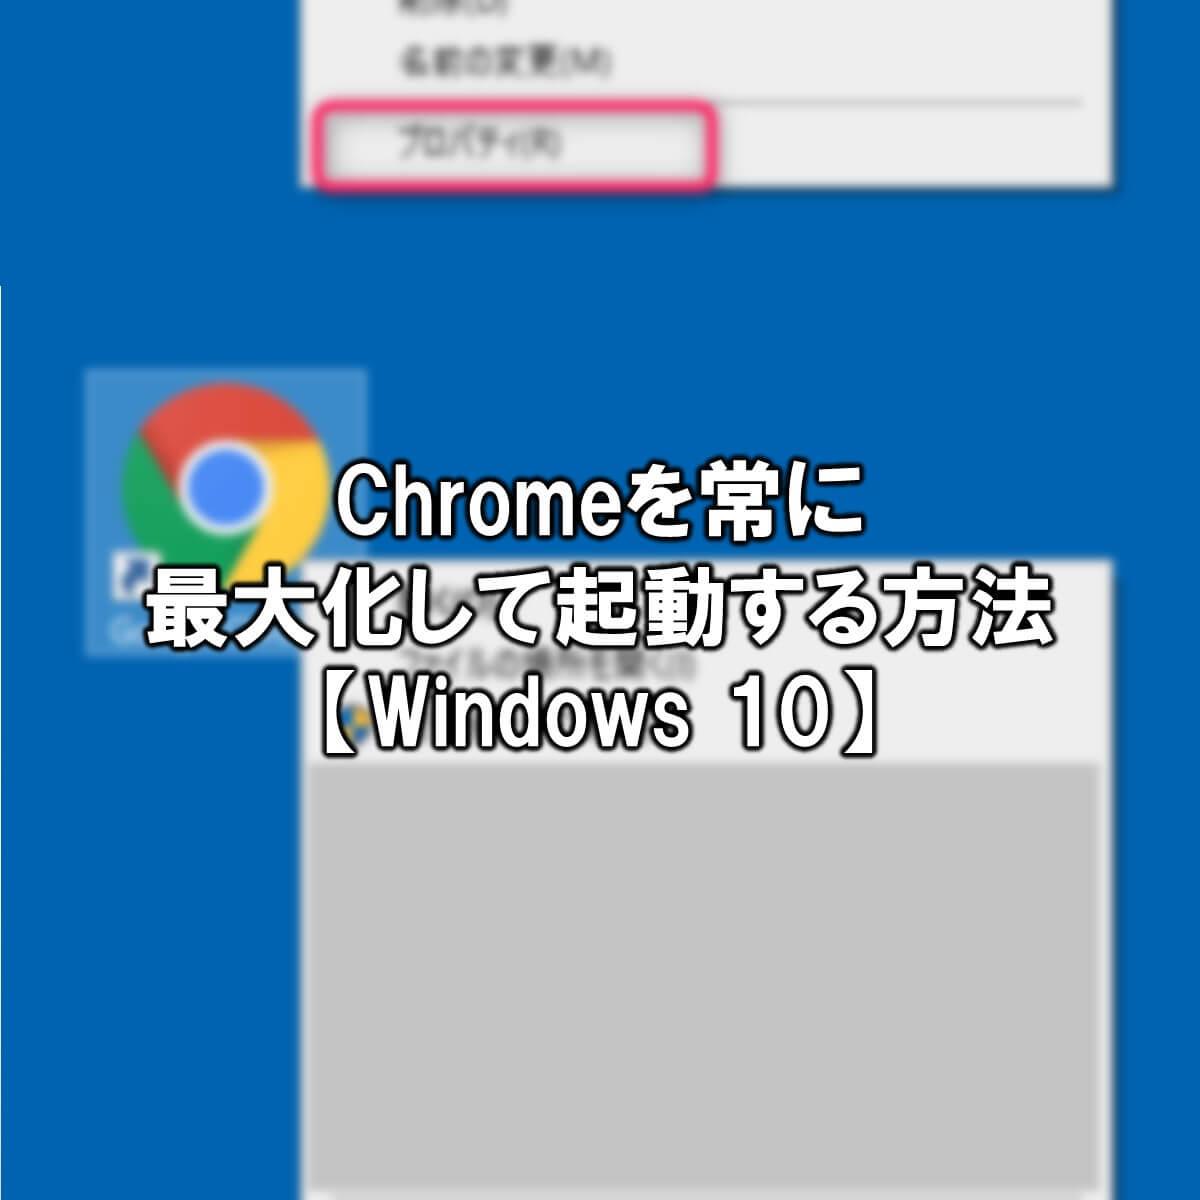 Chromeを常に最大化して起動する方法【Windows 10】